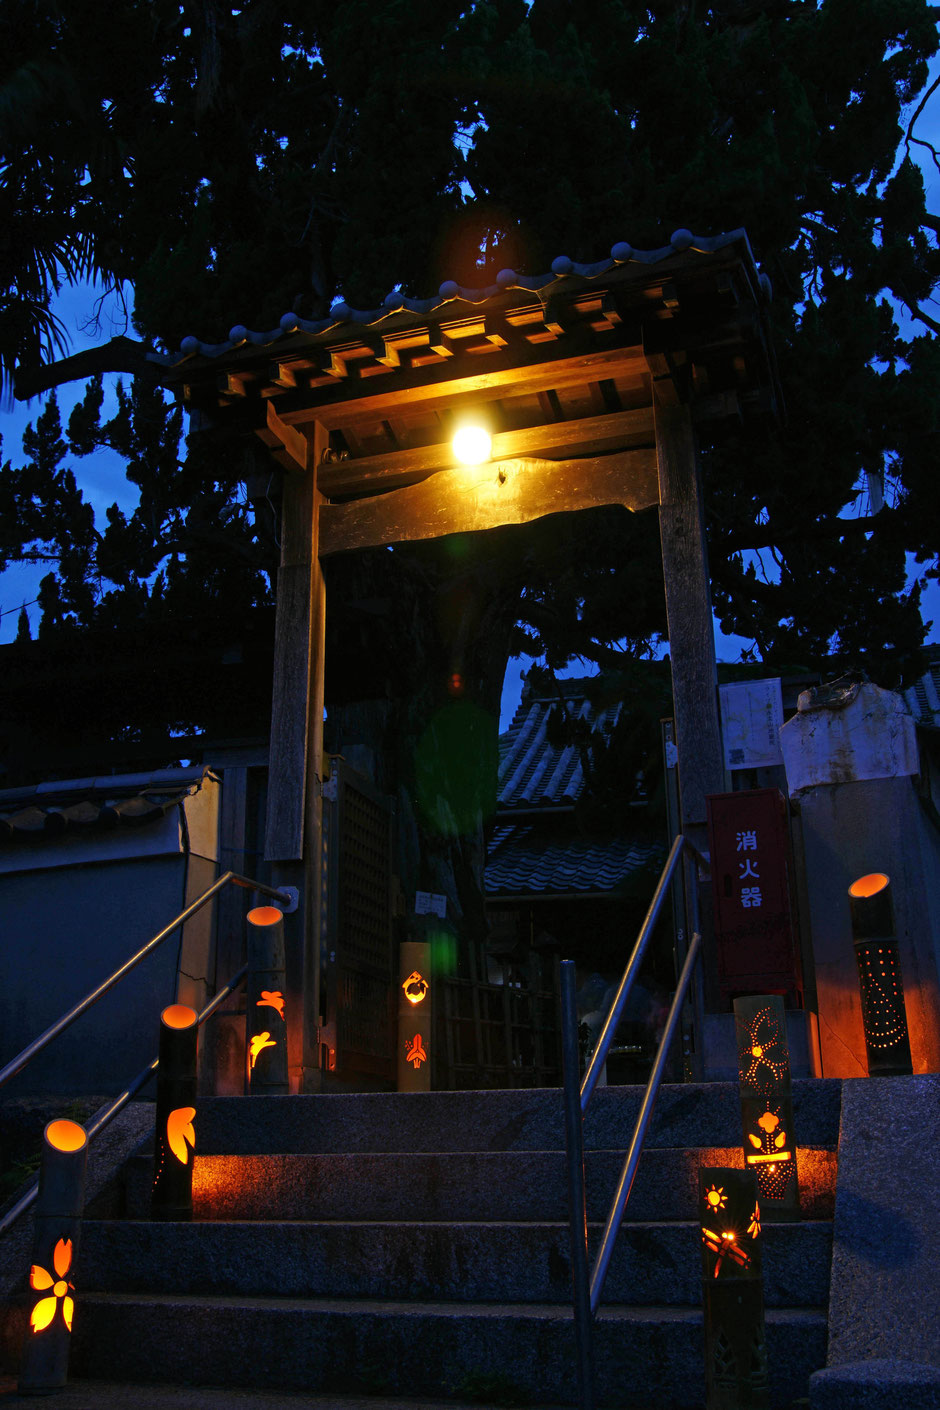 竹灯篭展示の様子